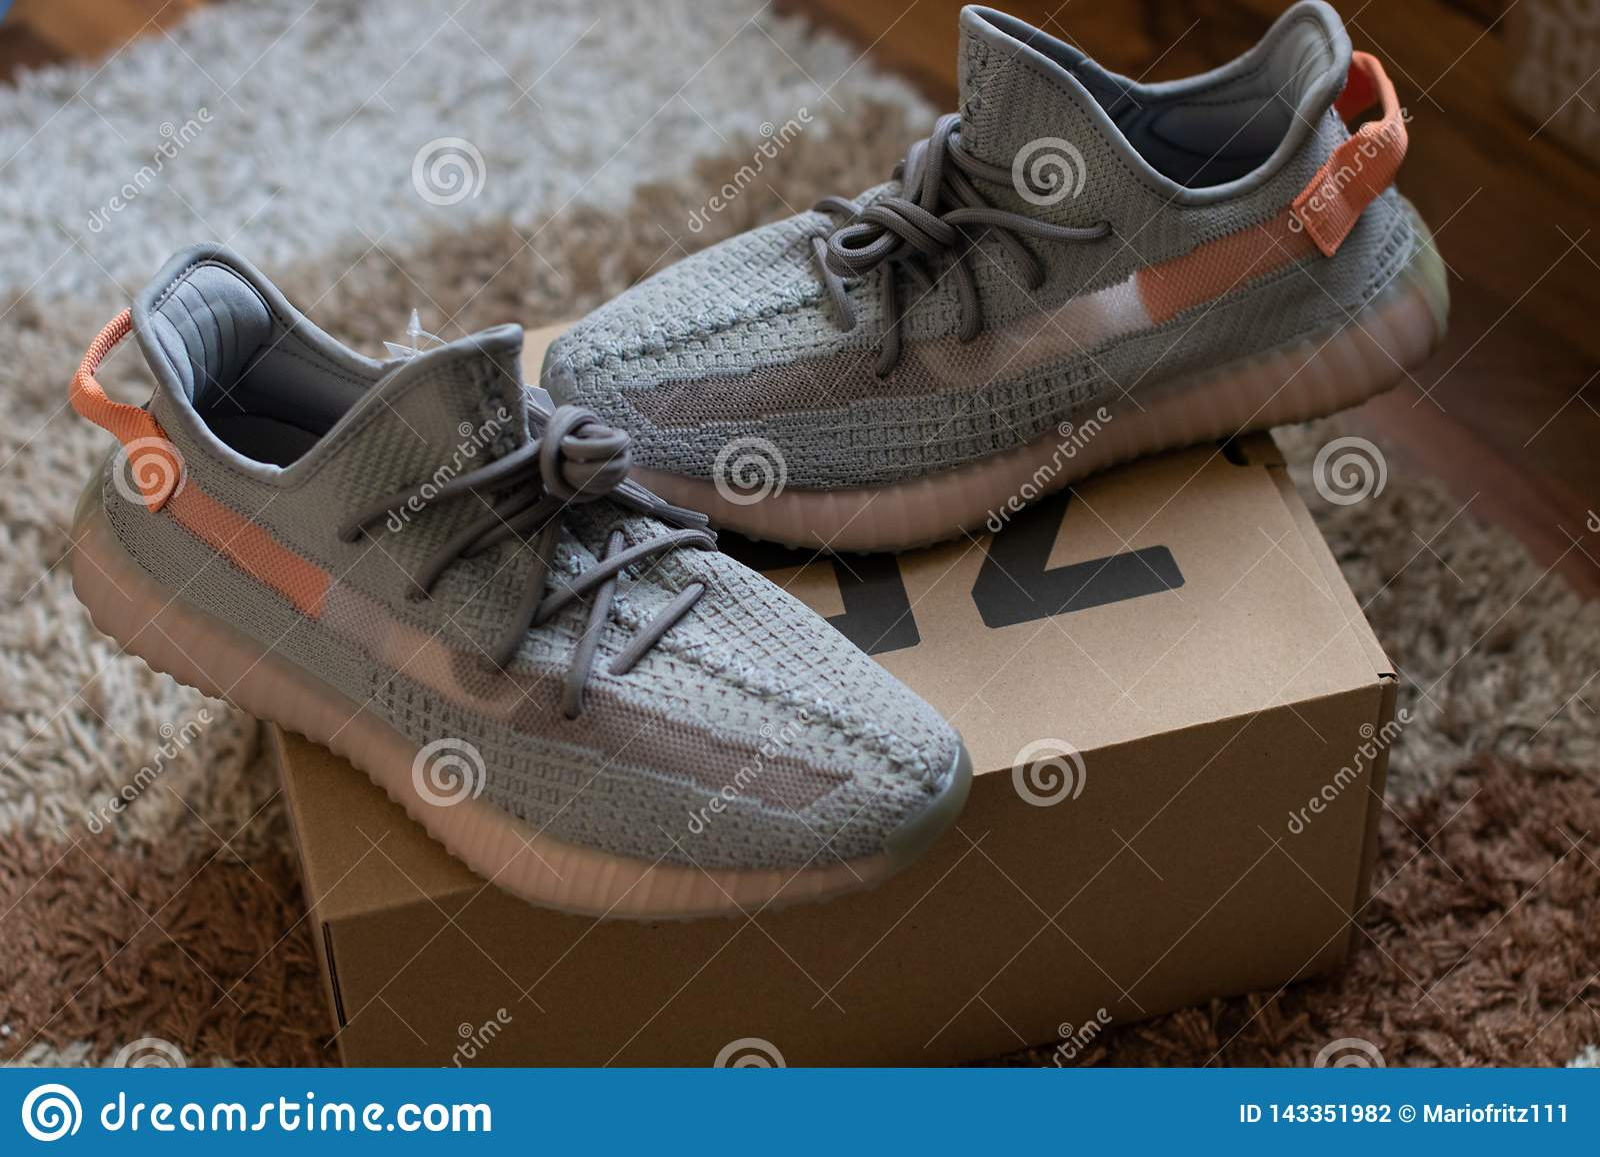 true form adidas